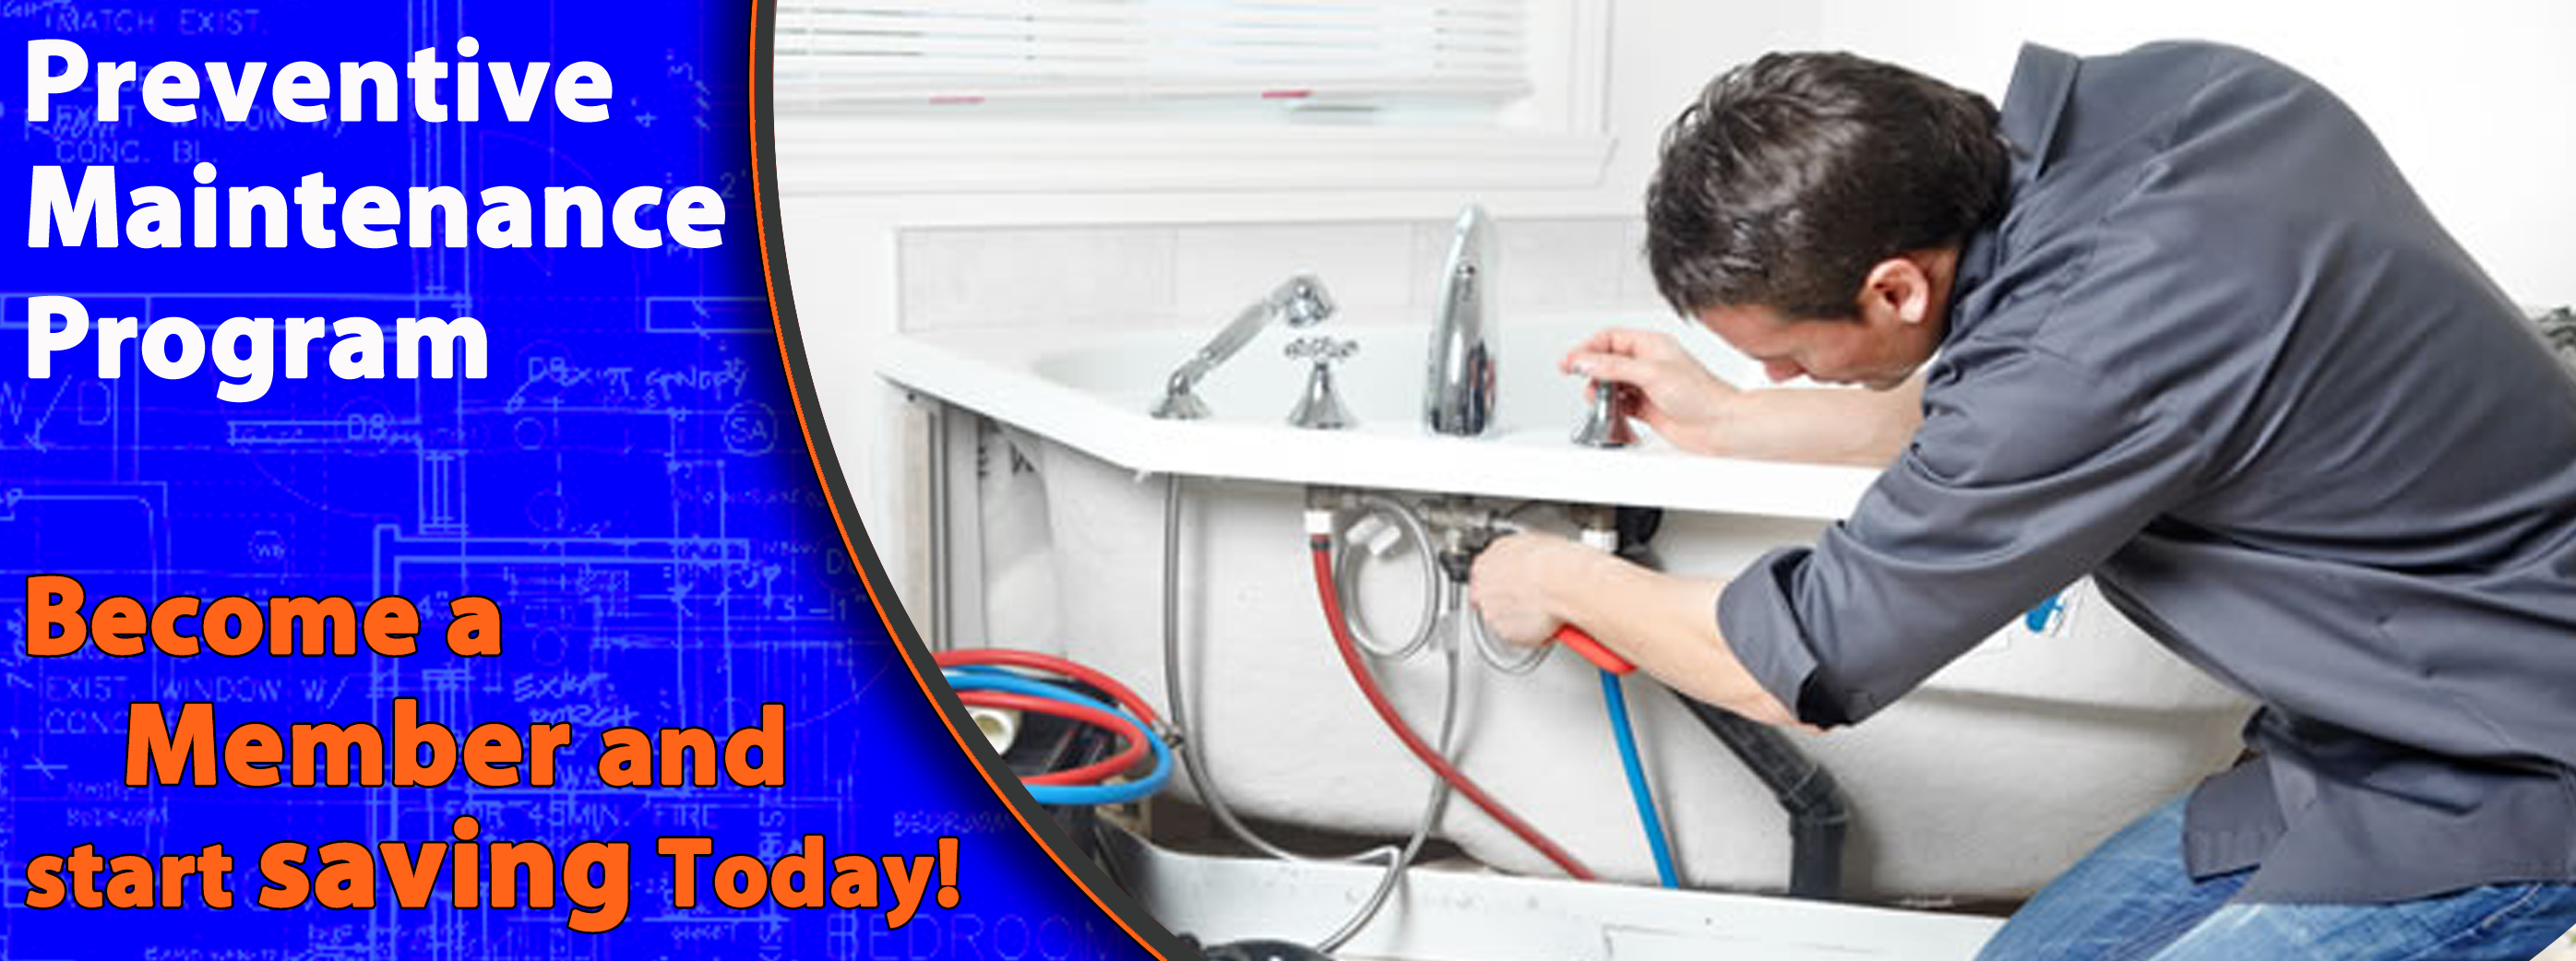 Preventive Maintenance Program